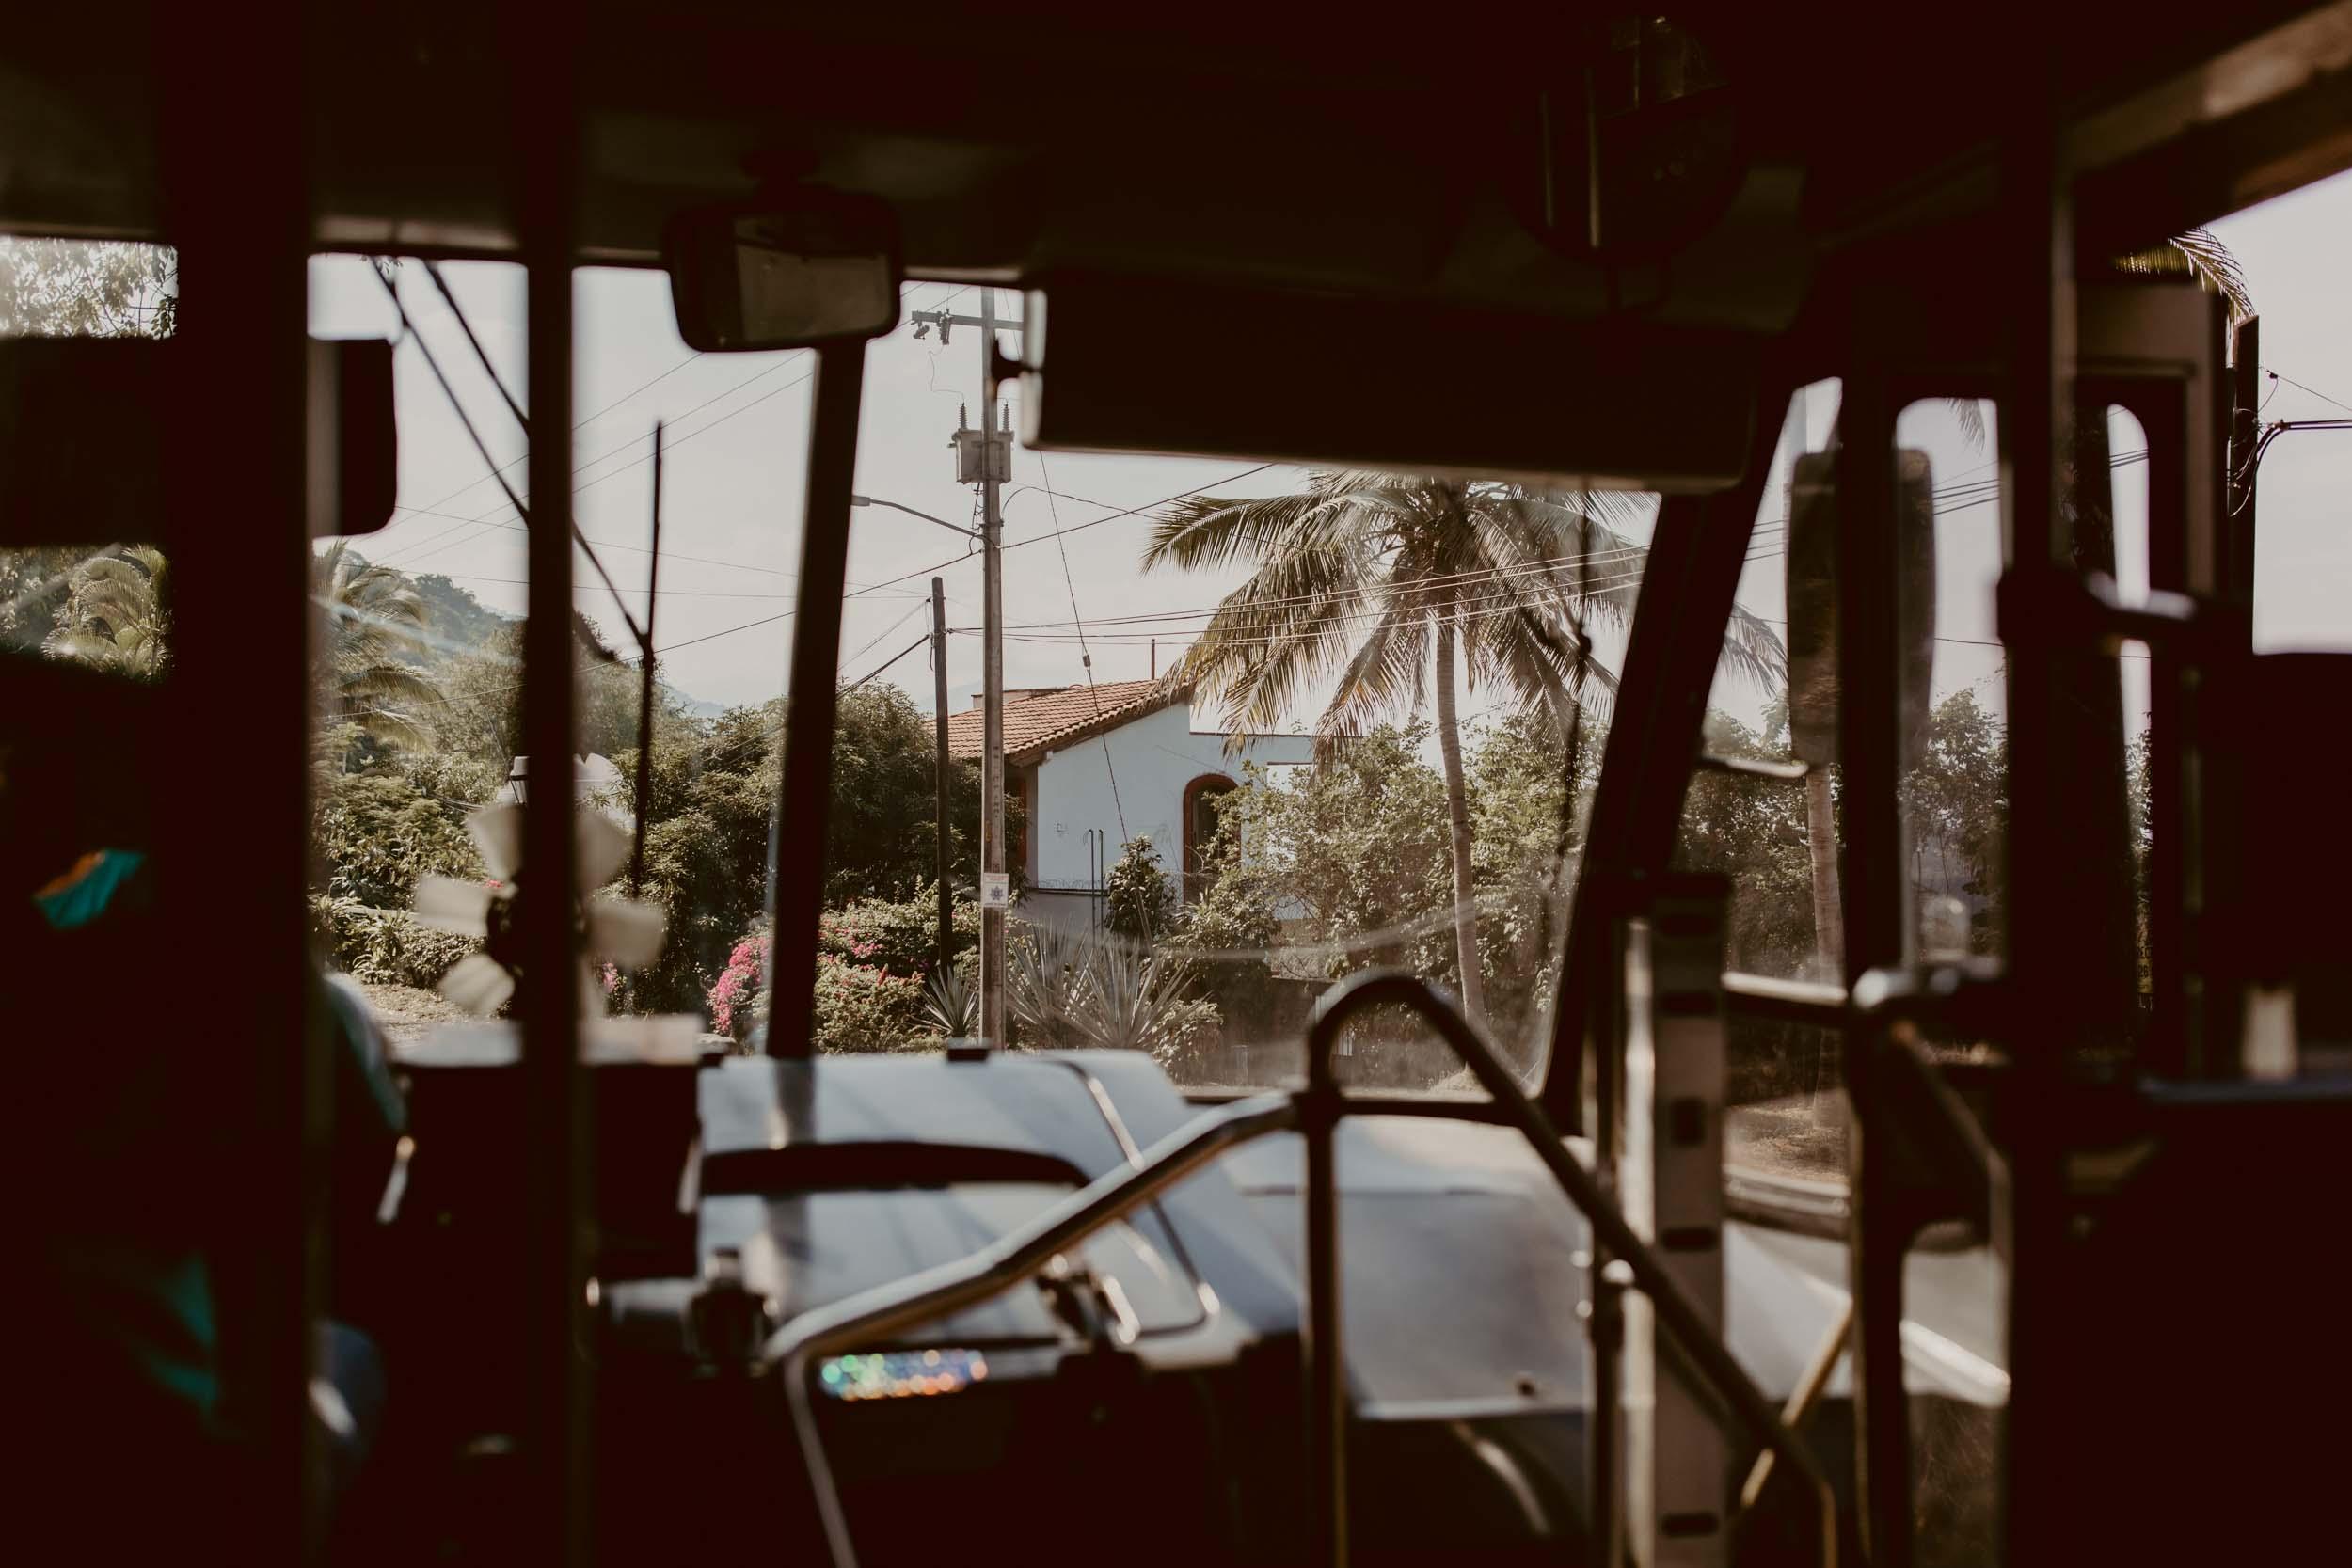 Miriam-Subbiah-puerto-vallarta-7.jpg